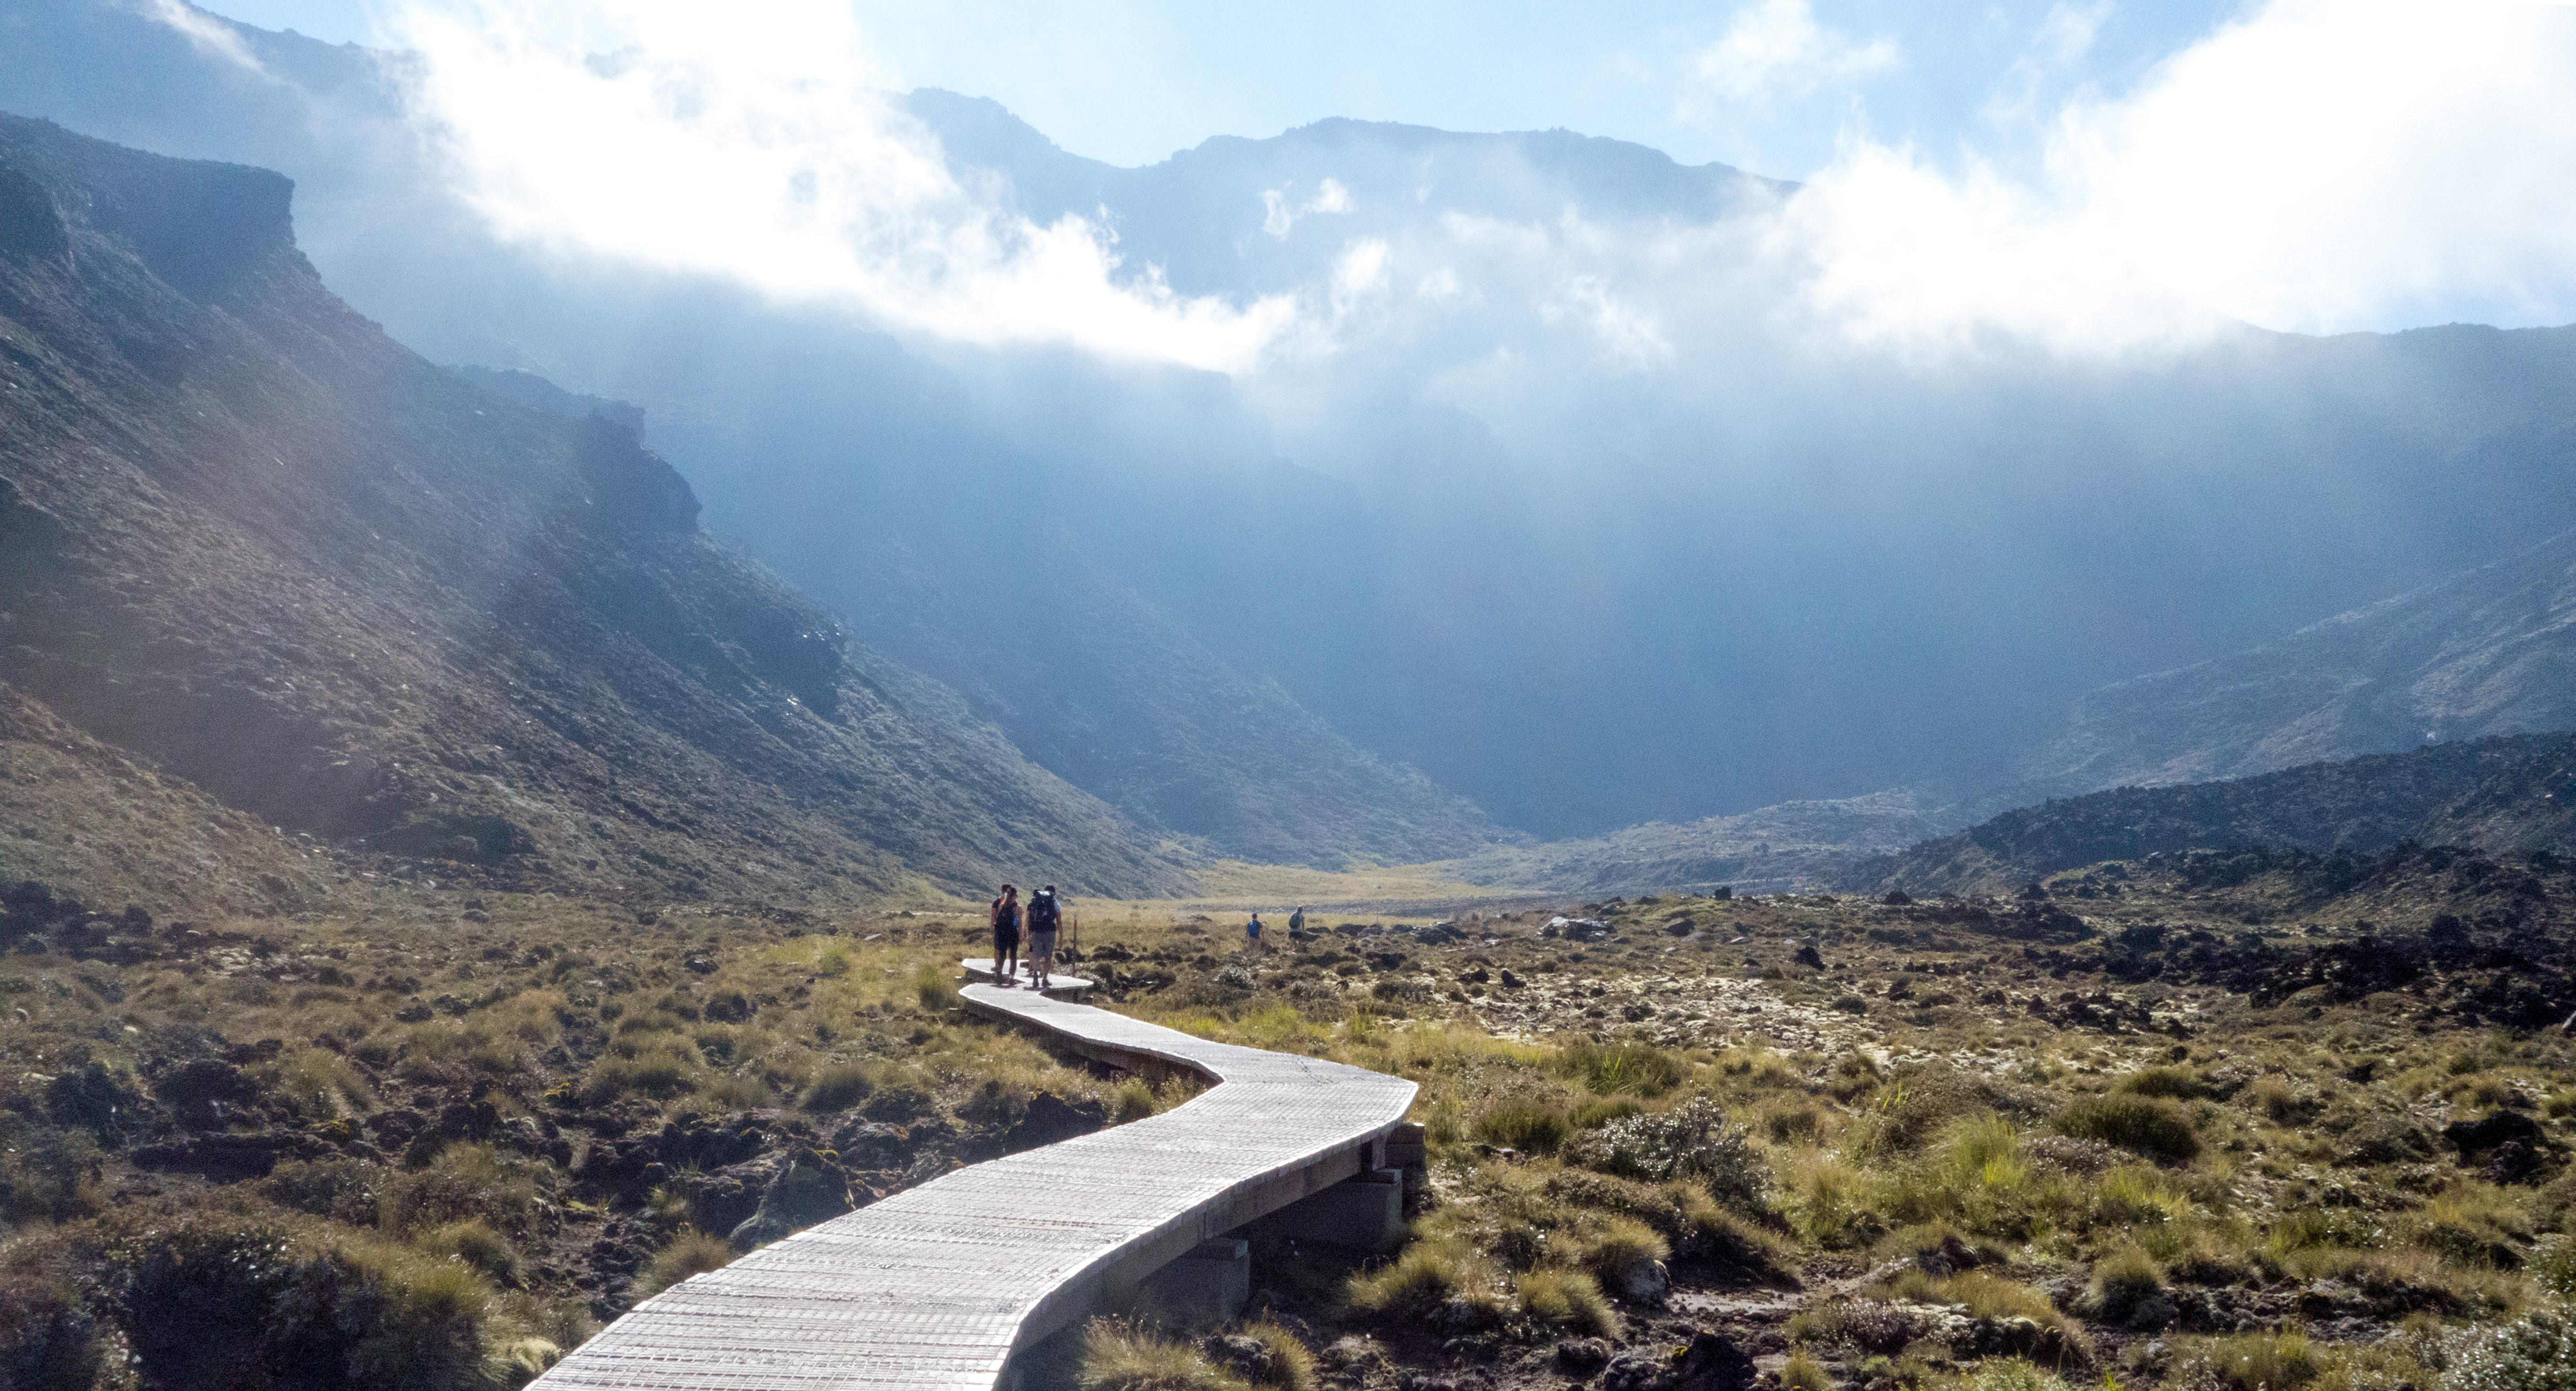 The Tongariro Crossing in New Zealand